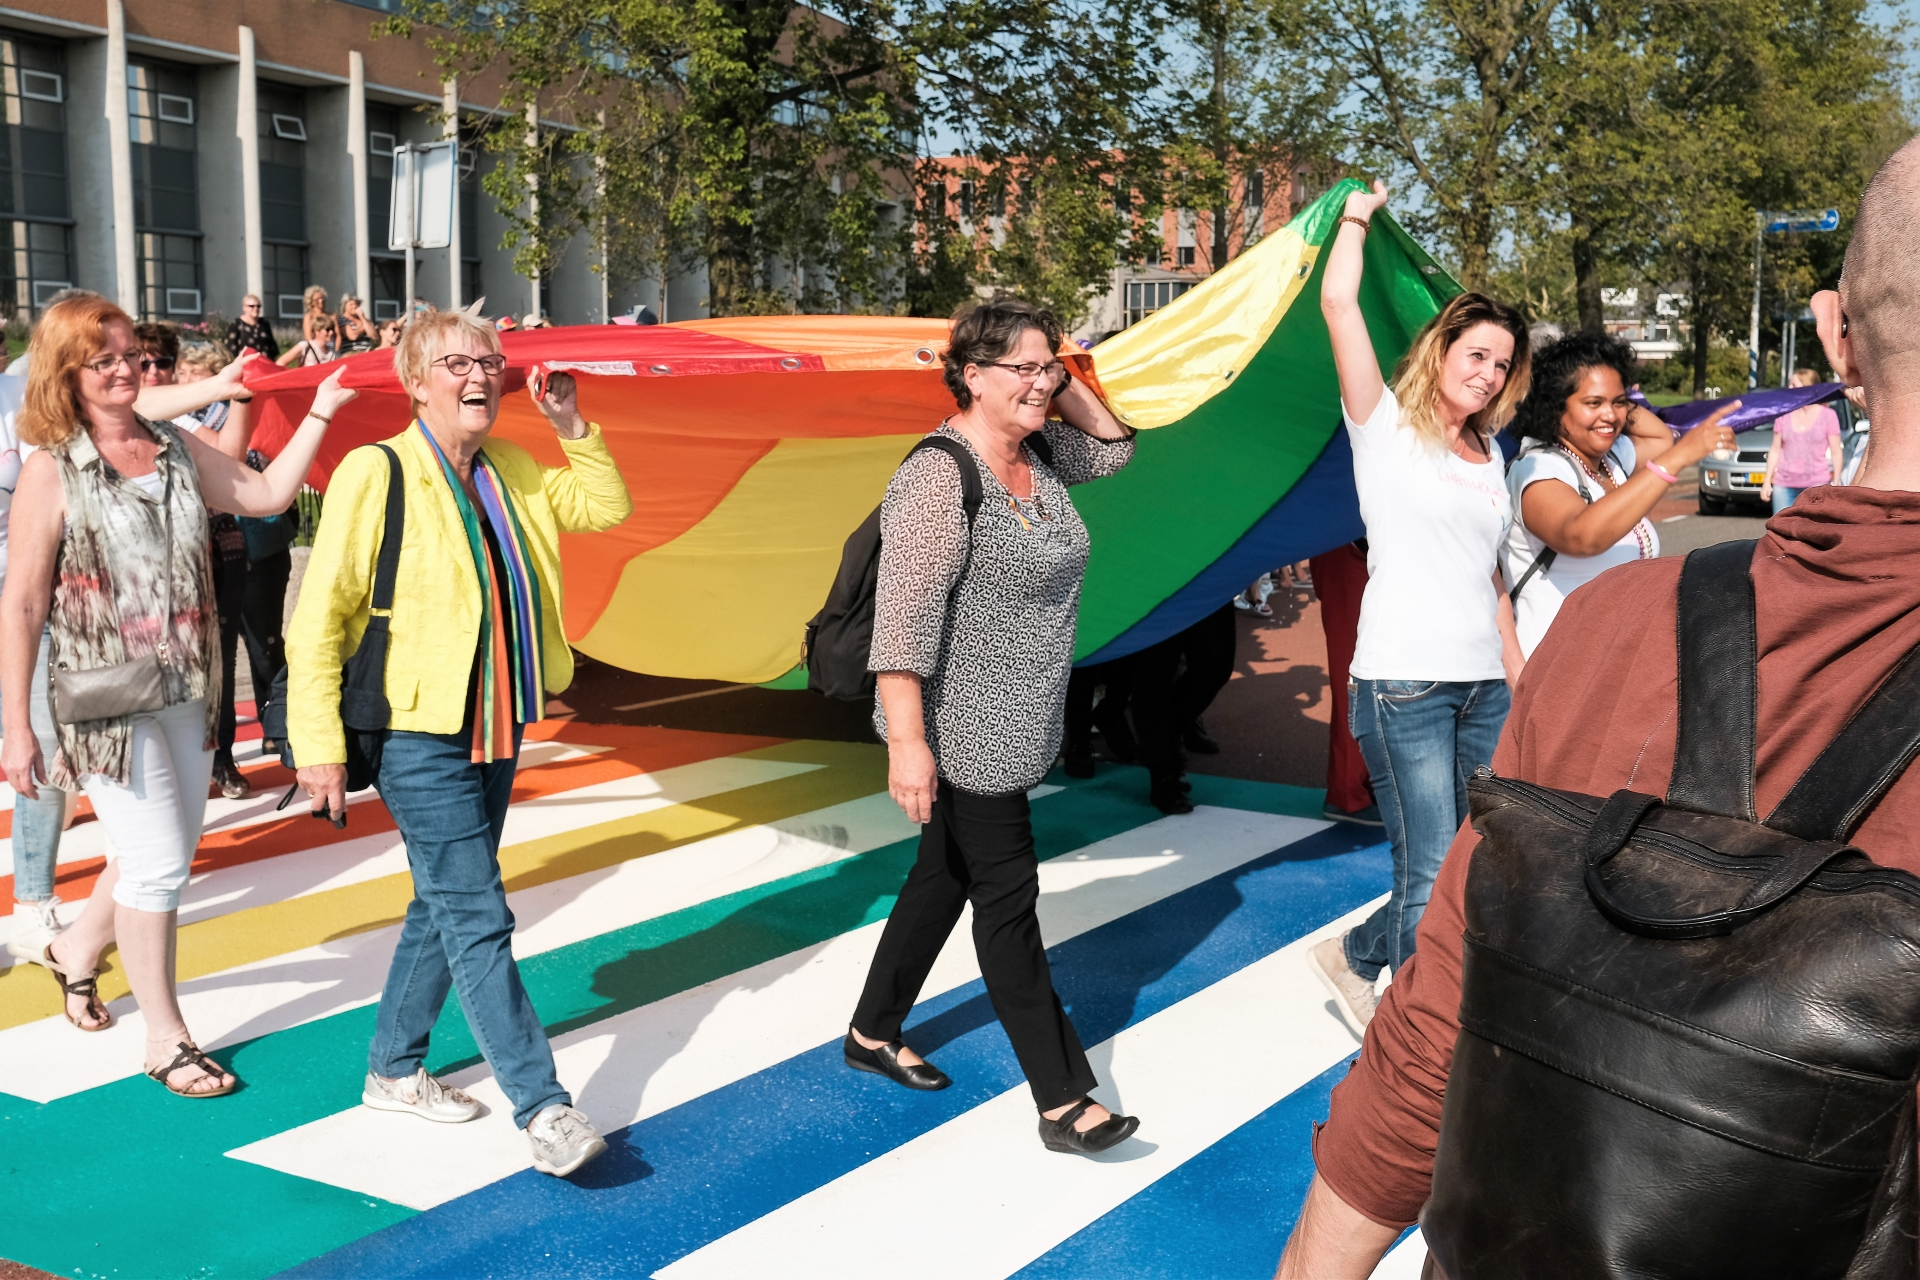 Trots van Regenboogzebrapad naar feest Roze Maandag op Kermis Hoorn